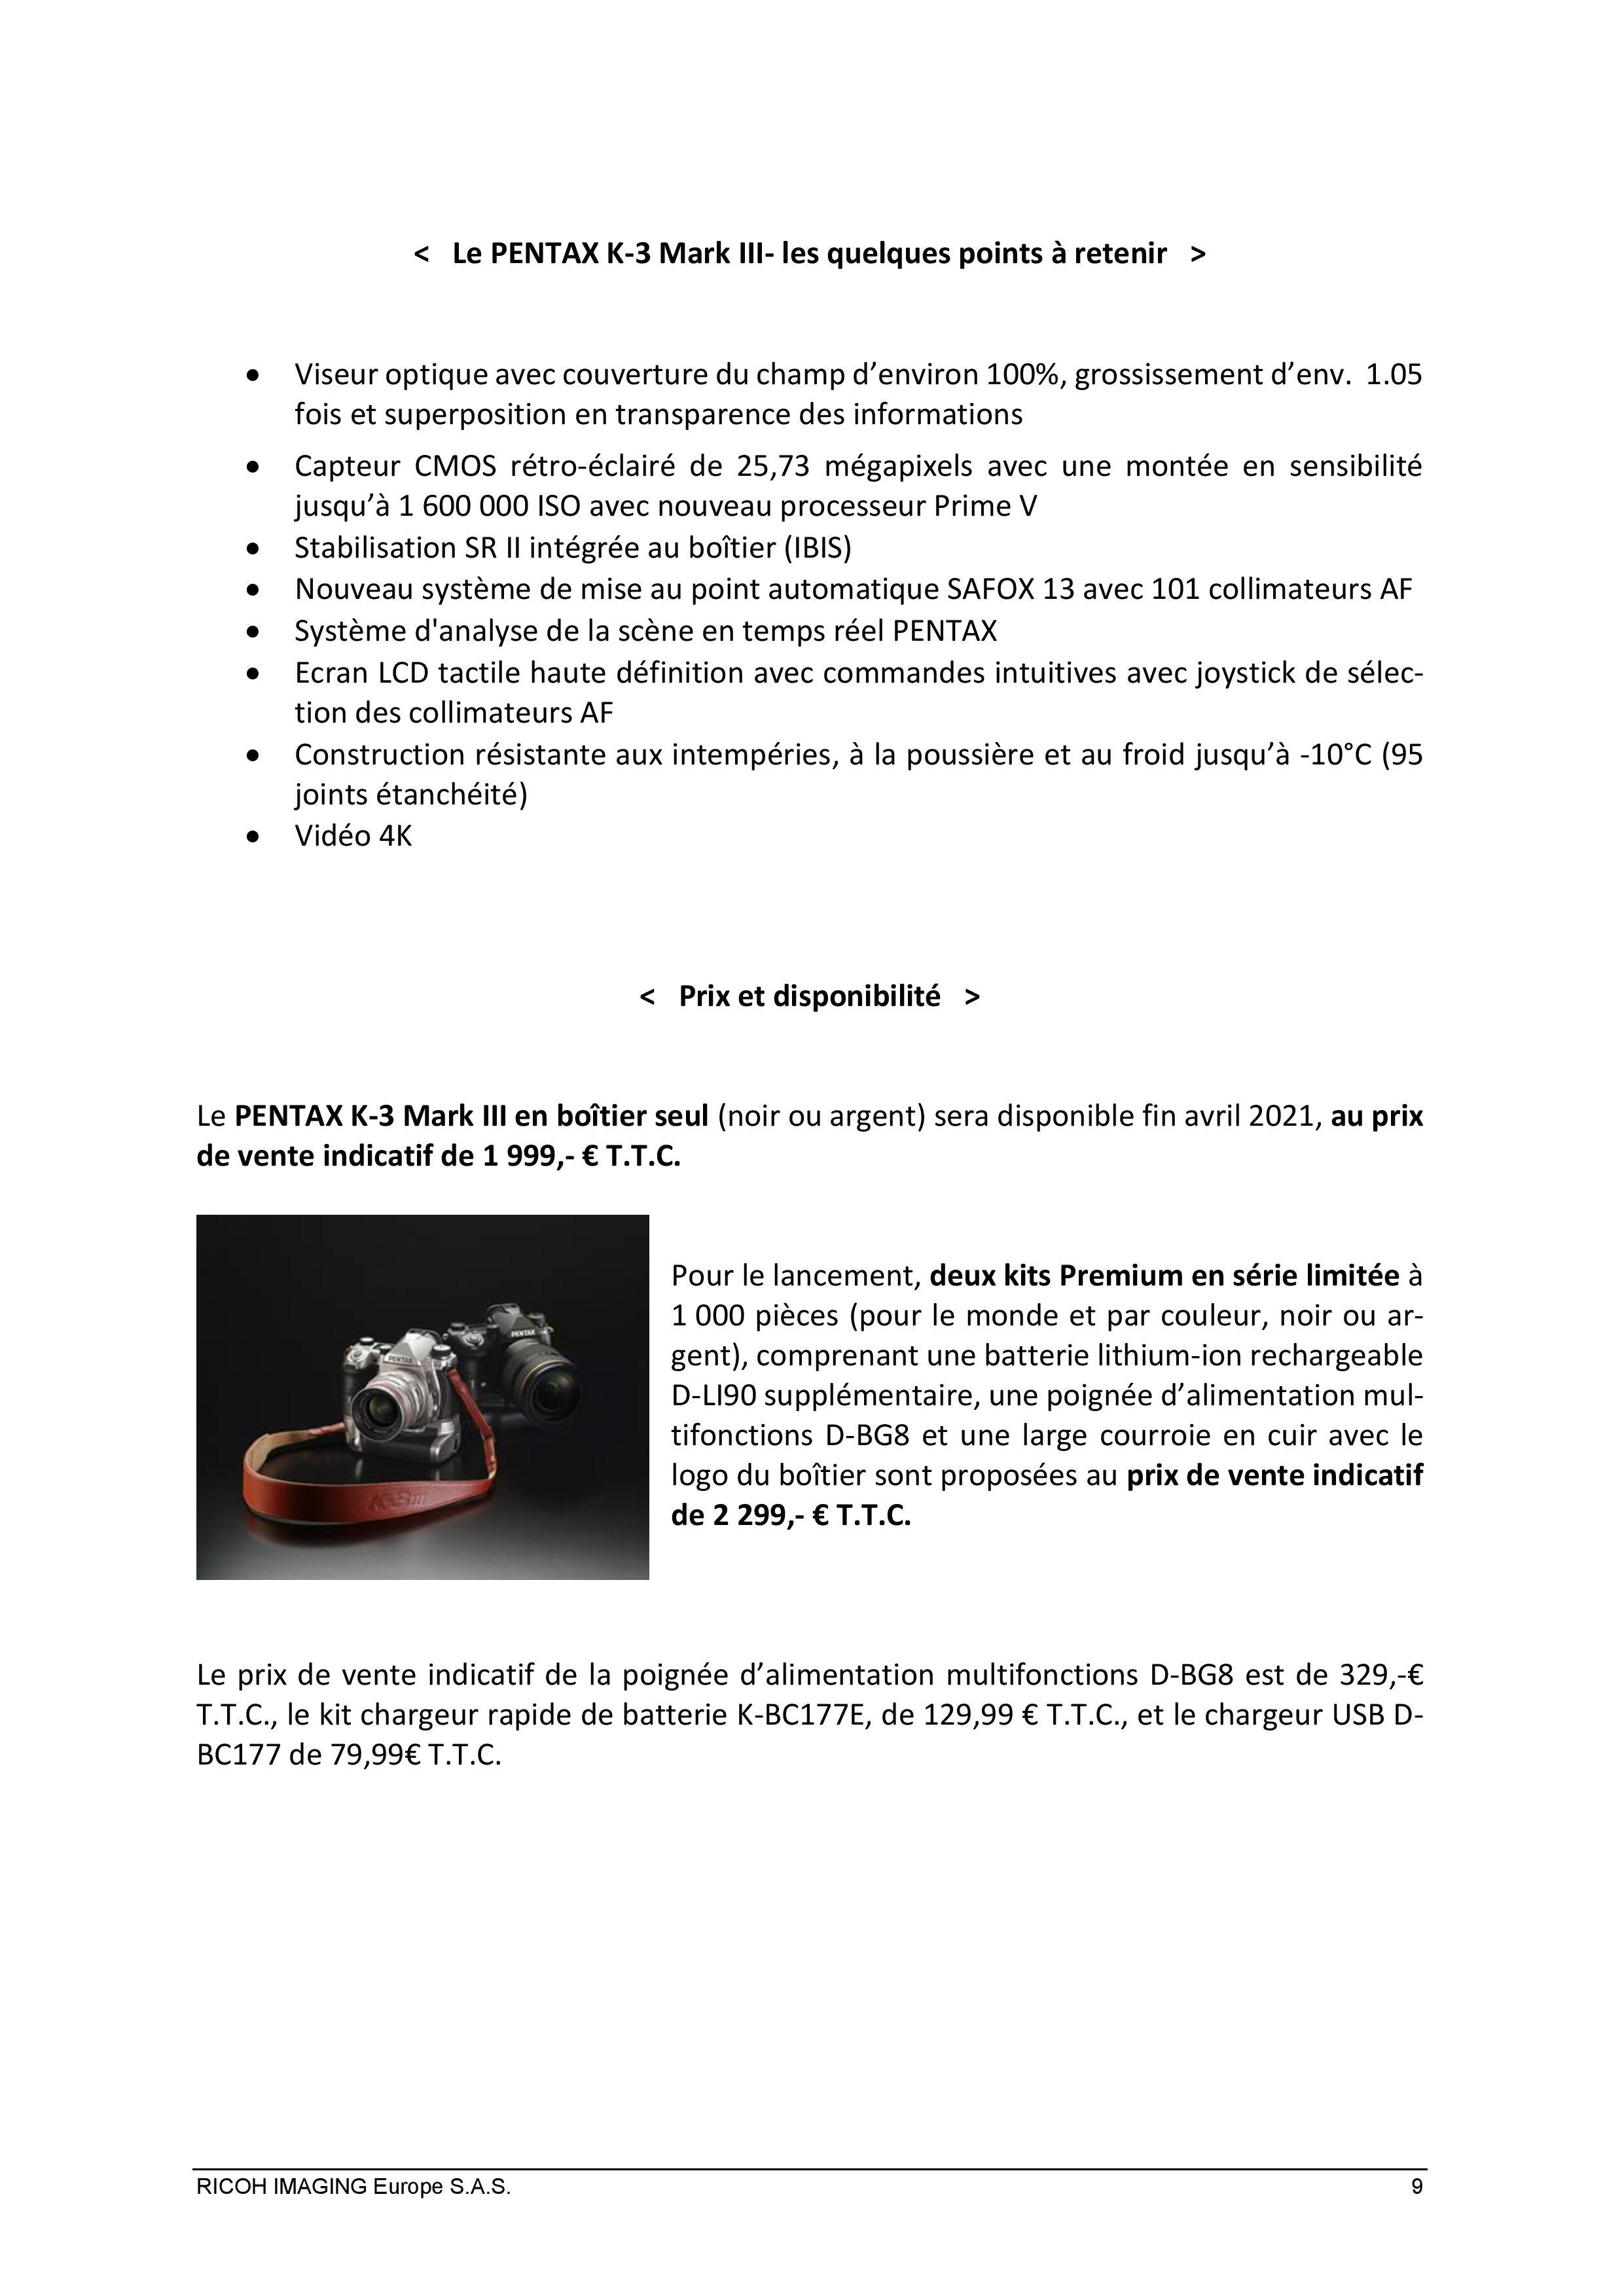 PENTAX RICOH IMAGING - Communiqué de presse du K3 Mark III 21033103160123142217344195